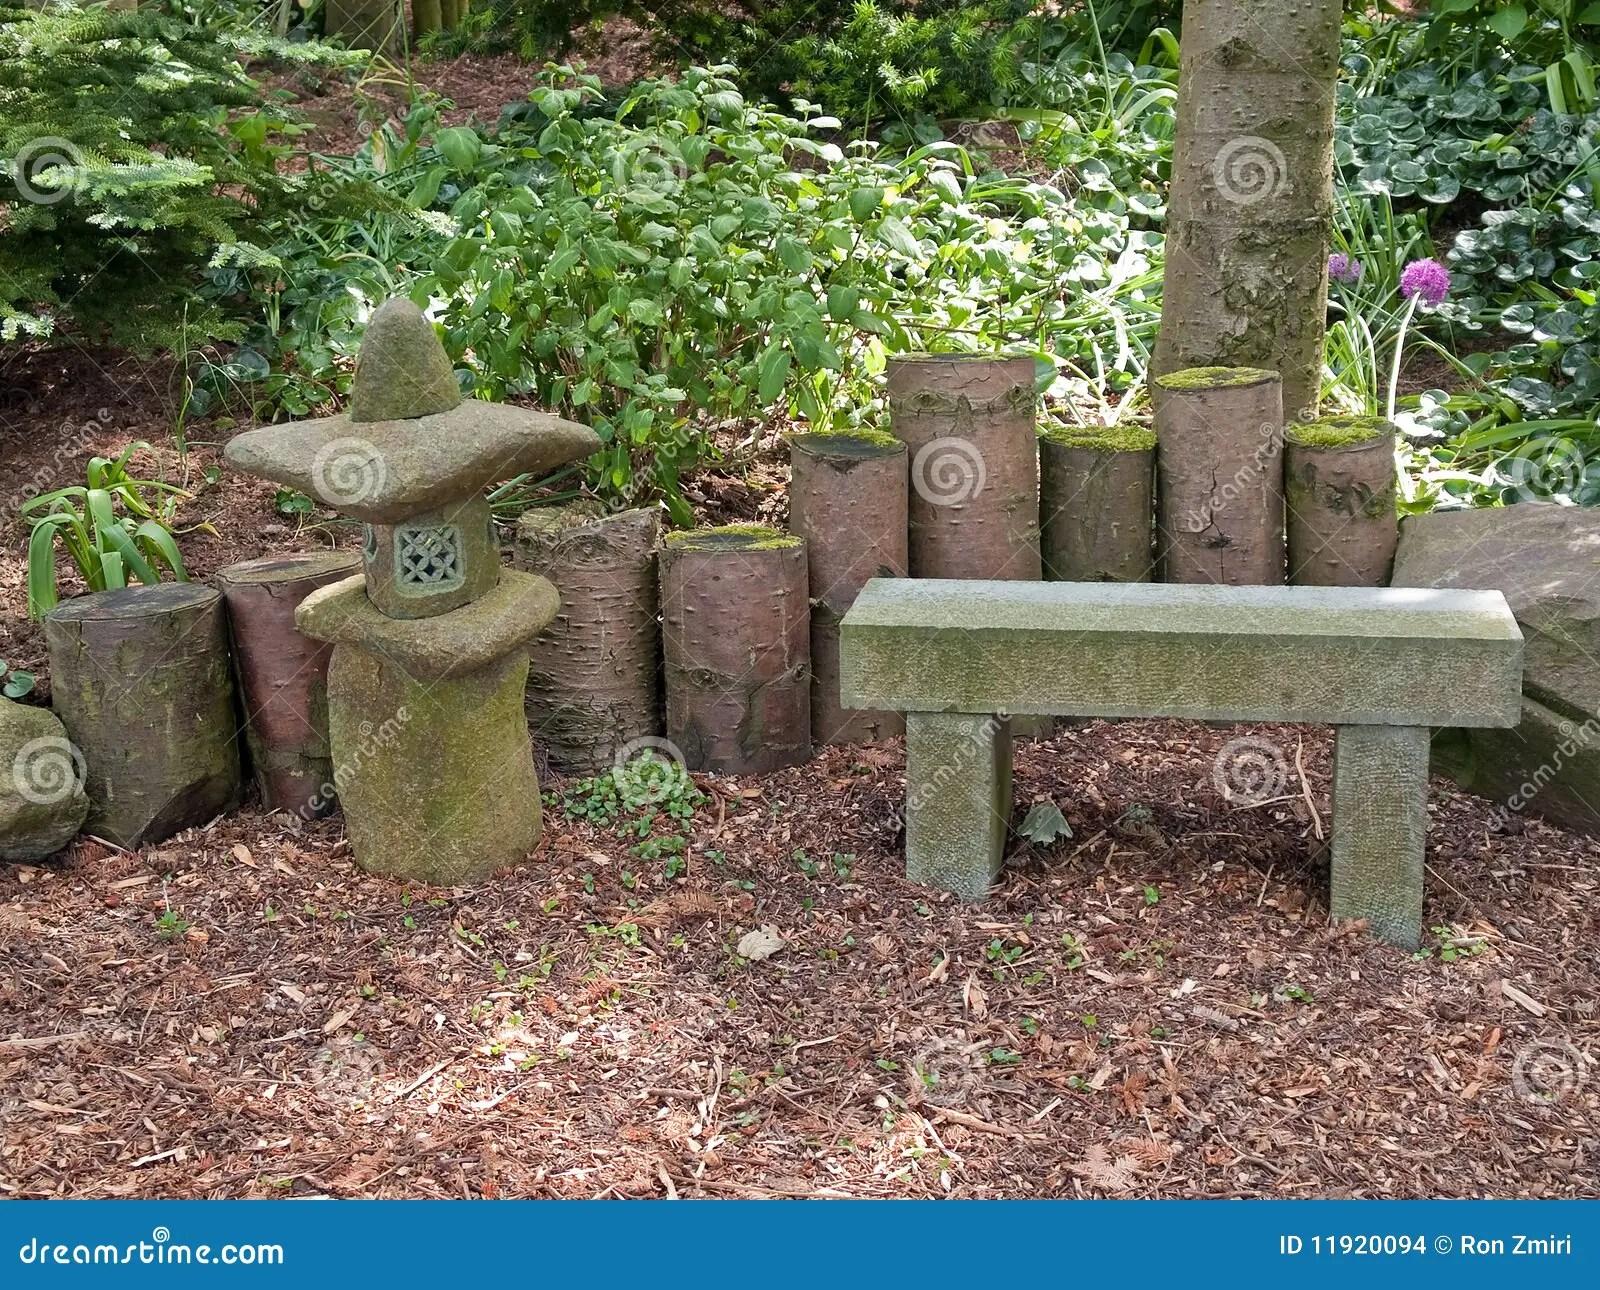 wood patio chair plans ikea harry covers beautiful japanese garden romantic seating corner stock photo - image: 11920094